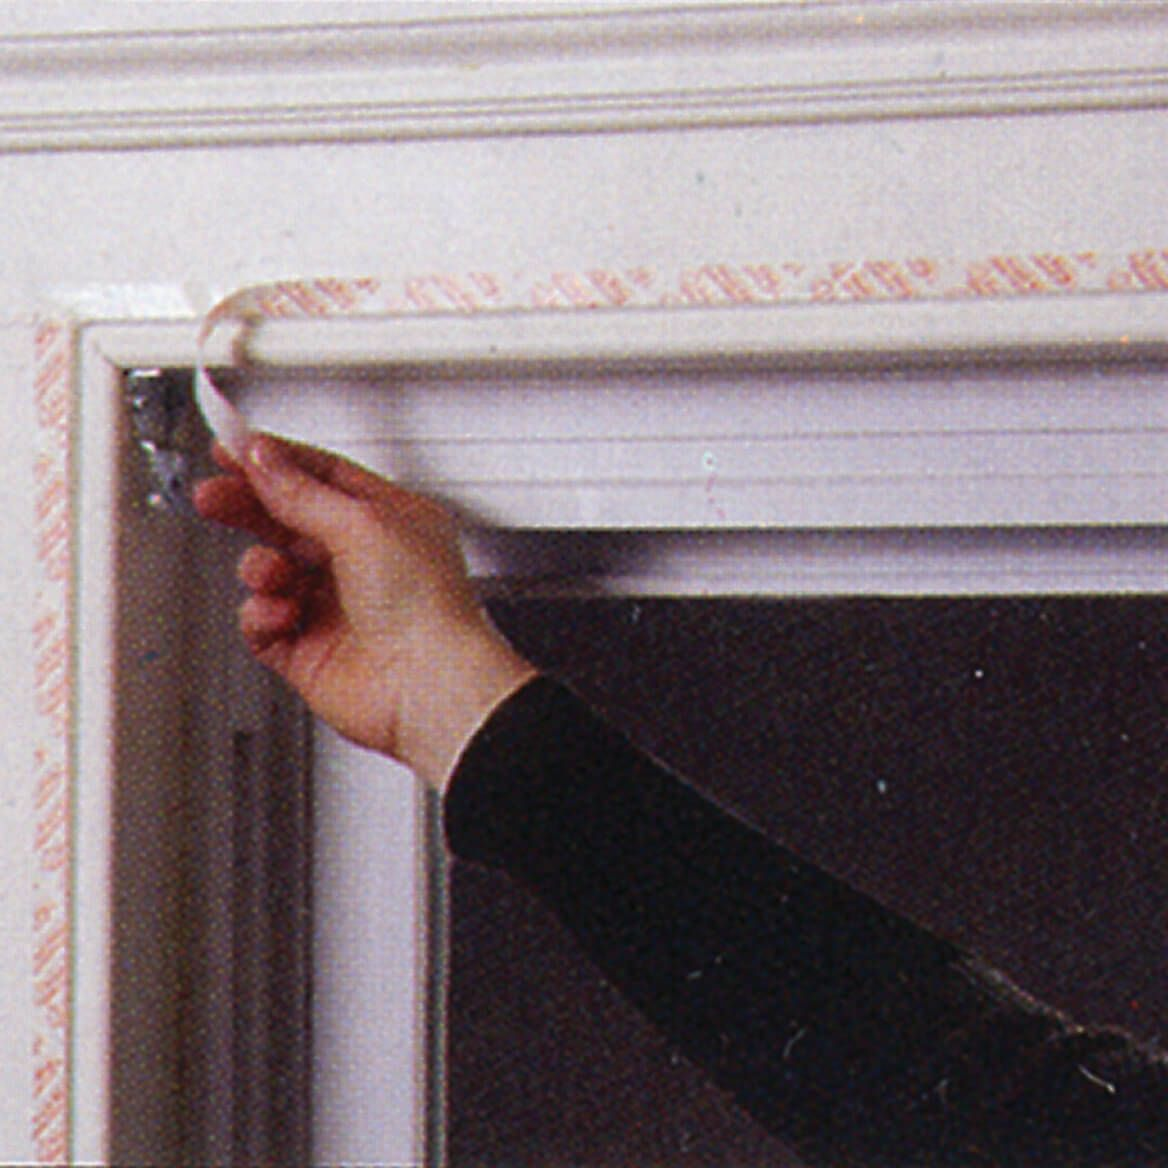 Window Insulation Shrink Kit 3 Pack Standard-370470